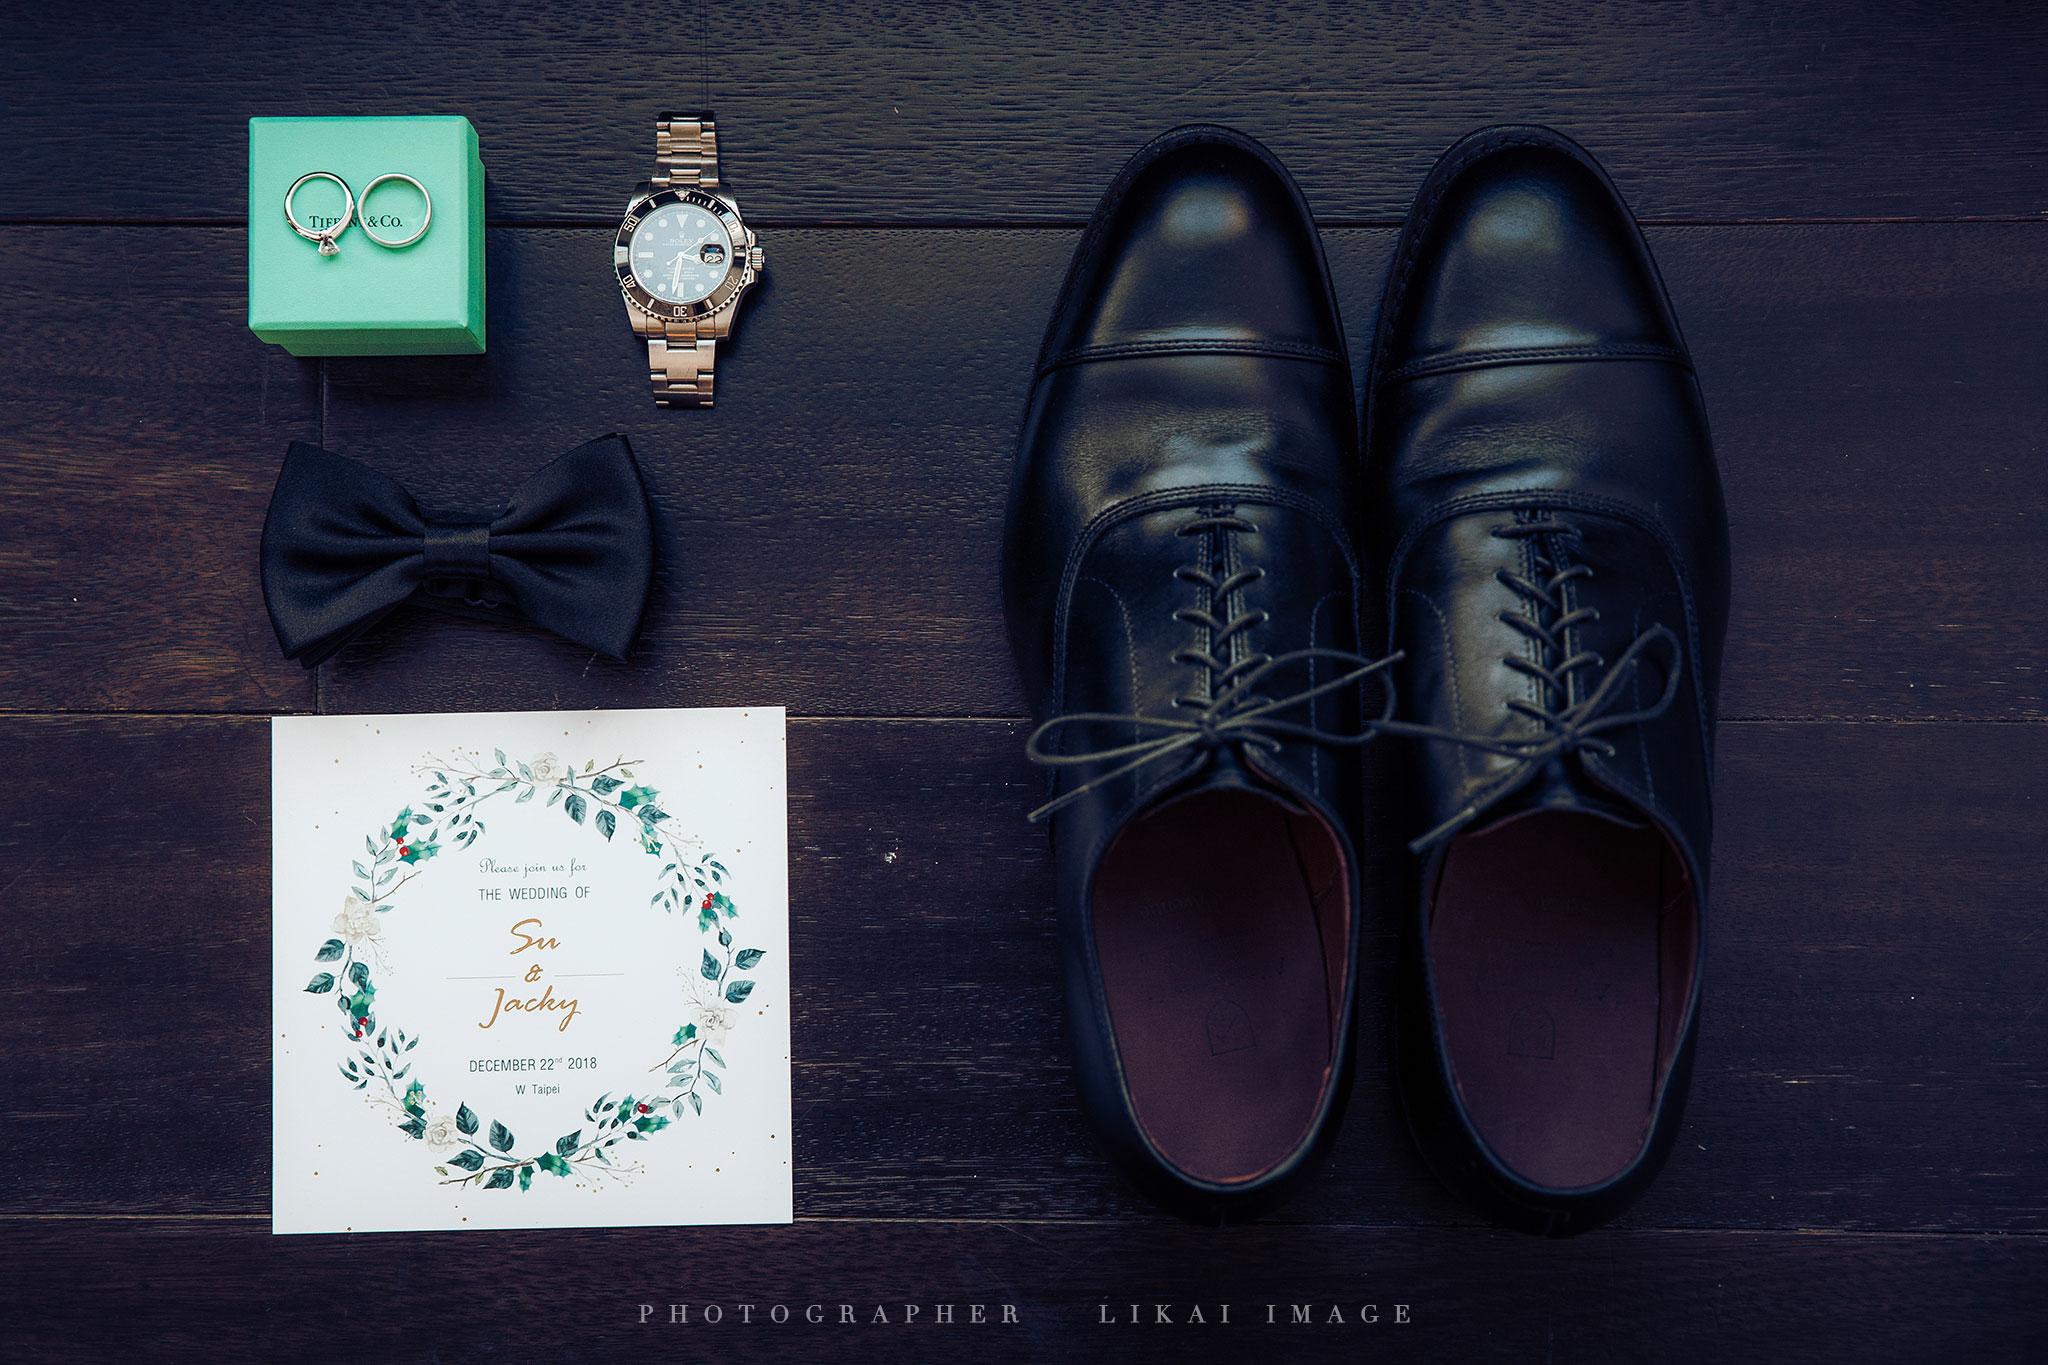 婚禮紀錄 - Su & Jacky - W Hotel